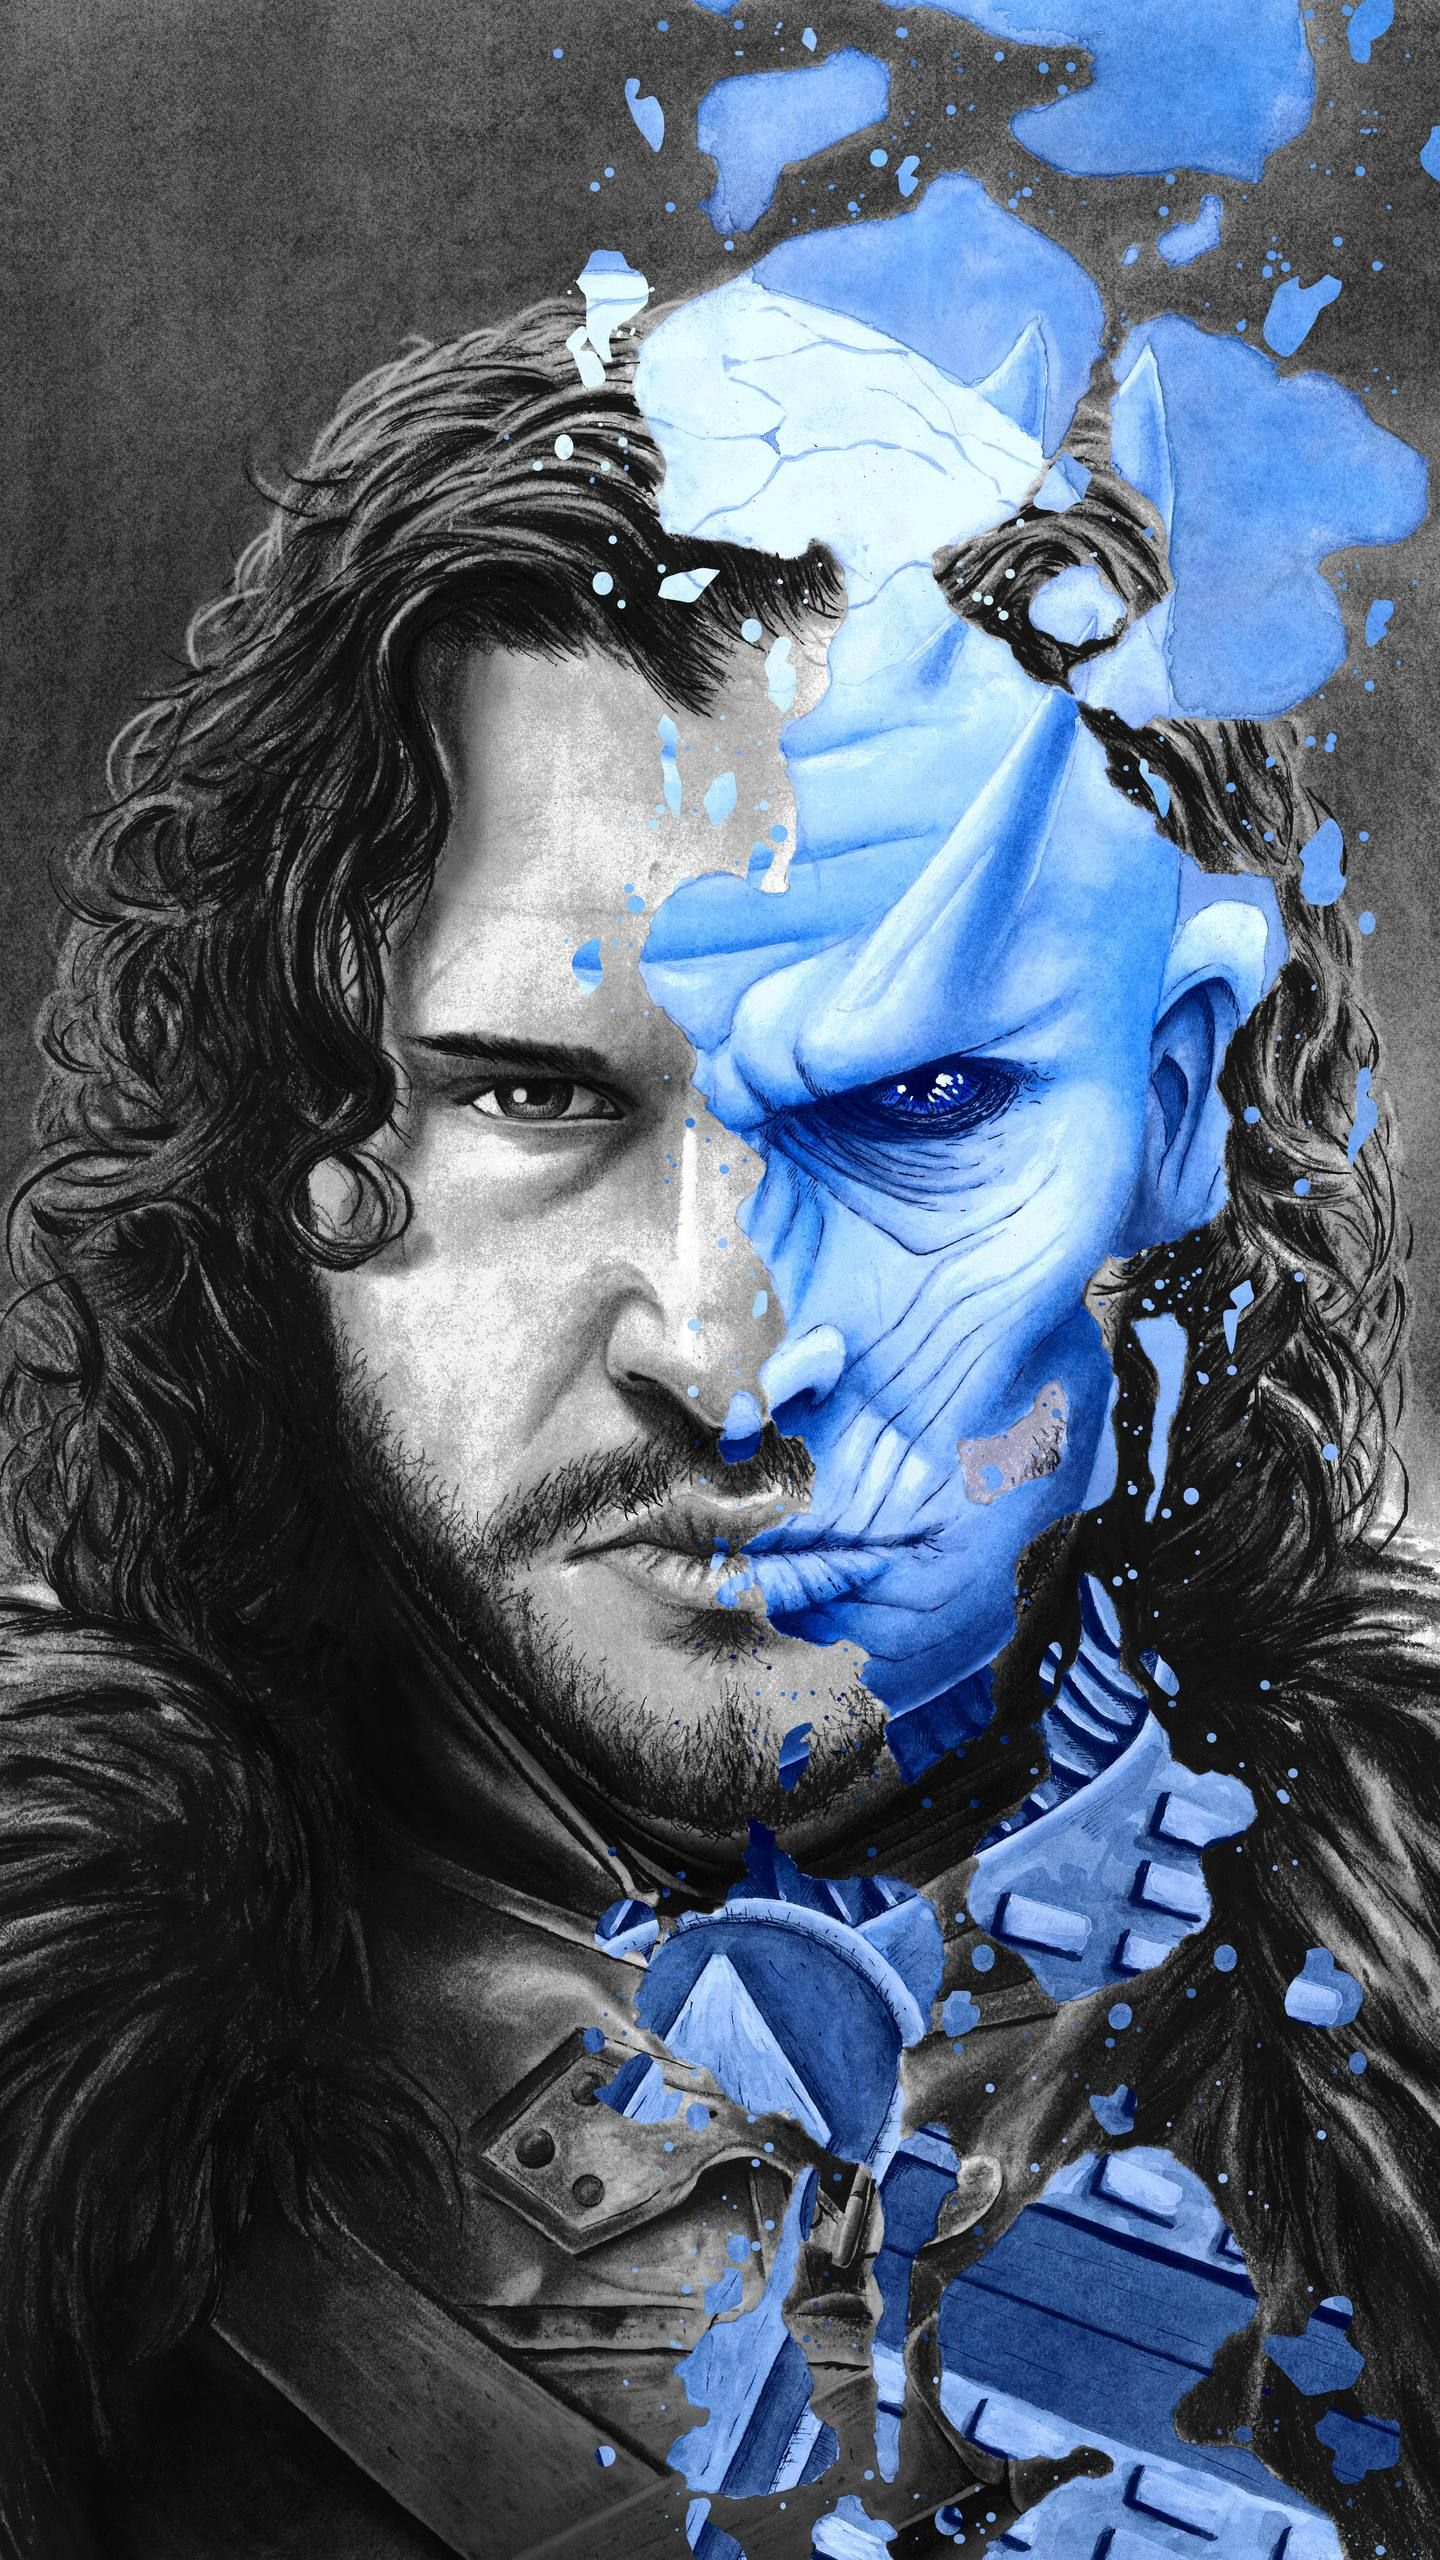 Game Of Thrones Wallpaper Jon Snow Night Kind Game Of Thrones Art Game Of Thrones Snow Illustration